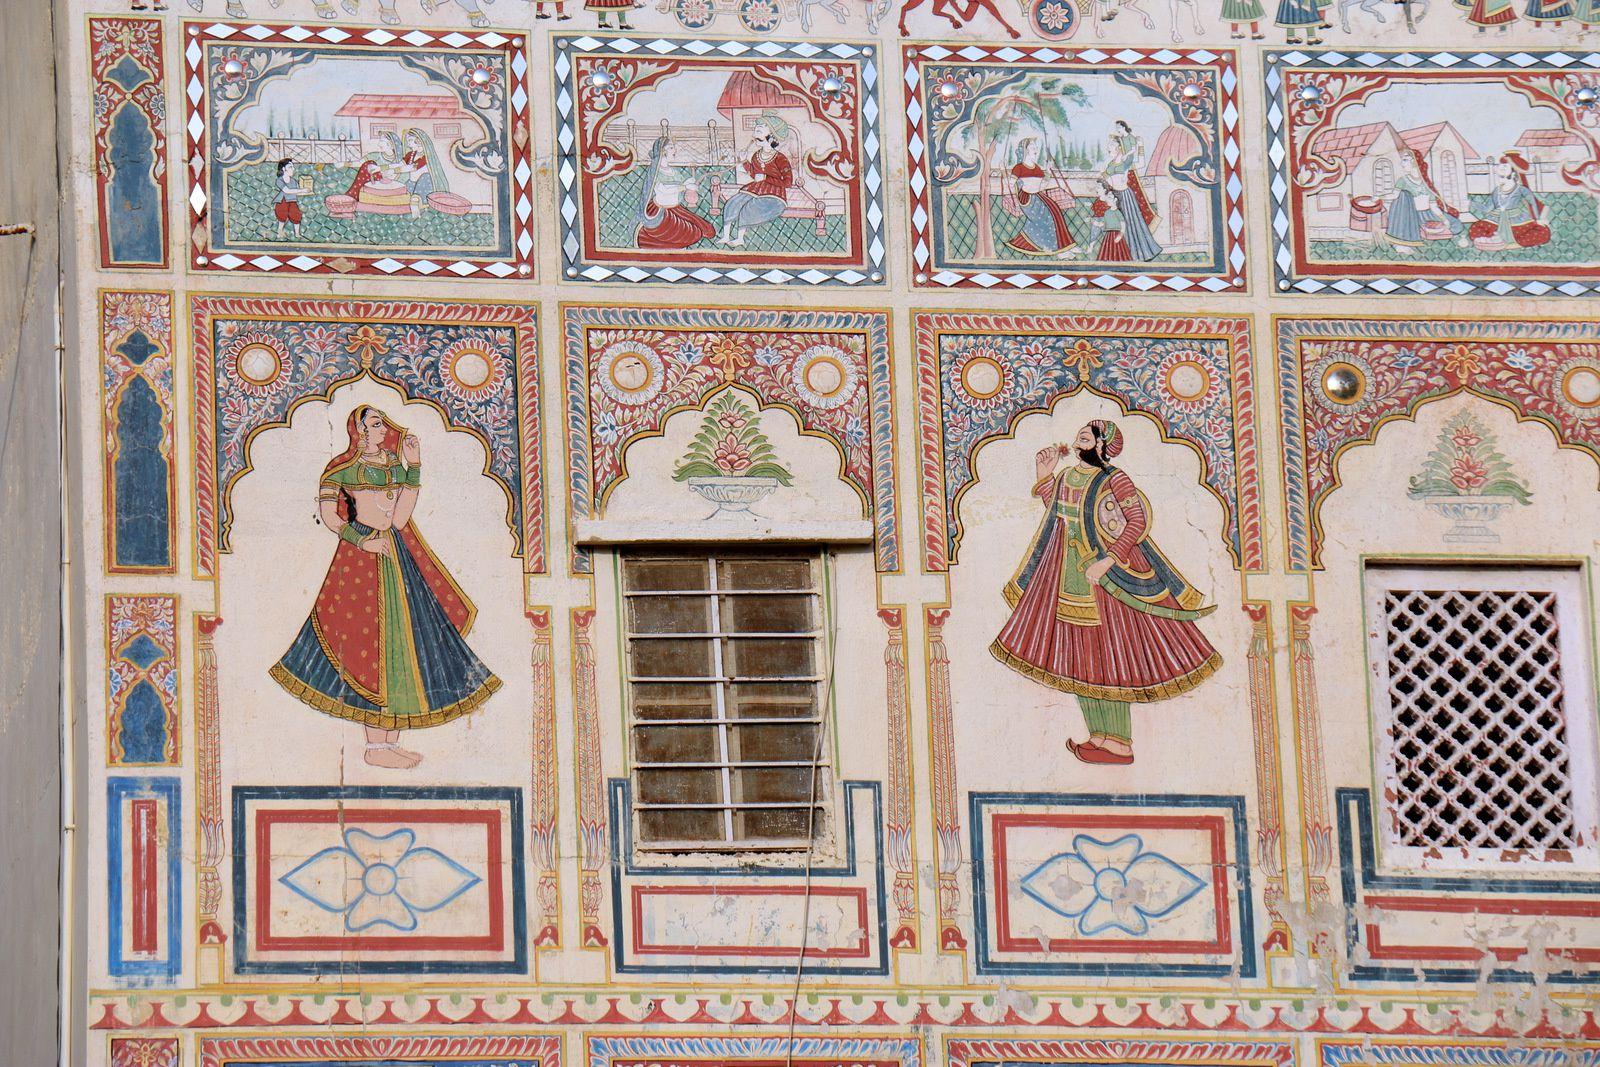 Hôtel &quot&#x3B;Shekhawati&quot&#x3B; à Mandawa (Rajasthan, Inde), fresques